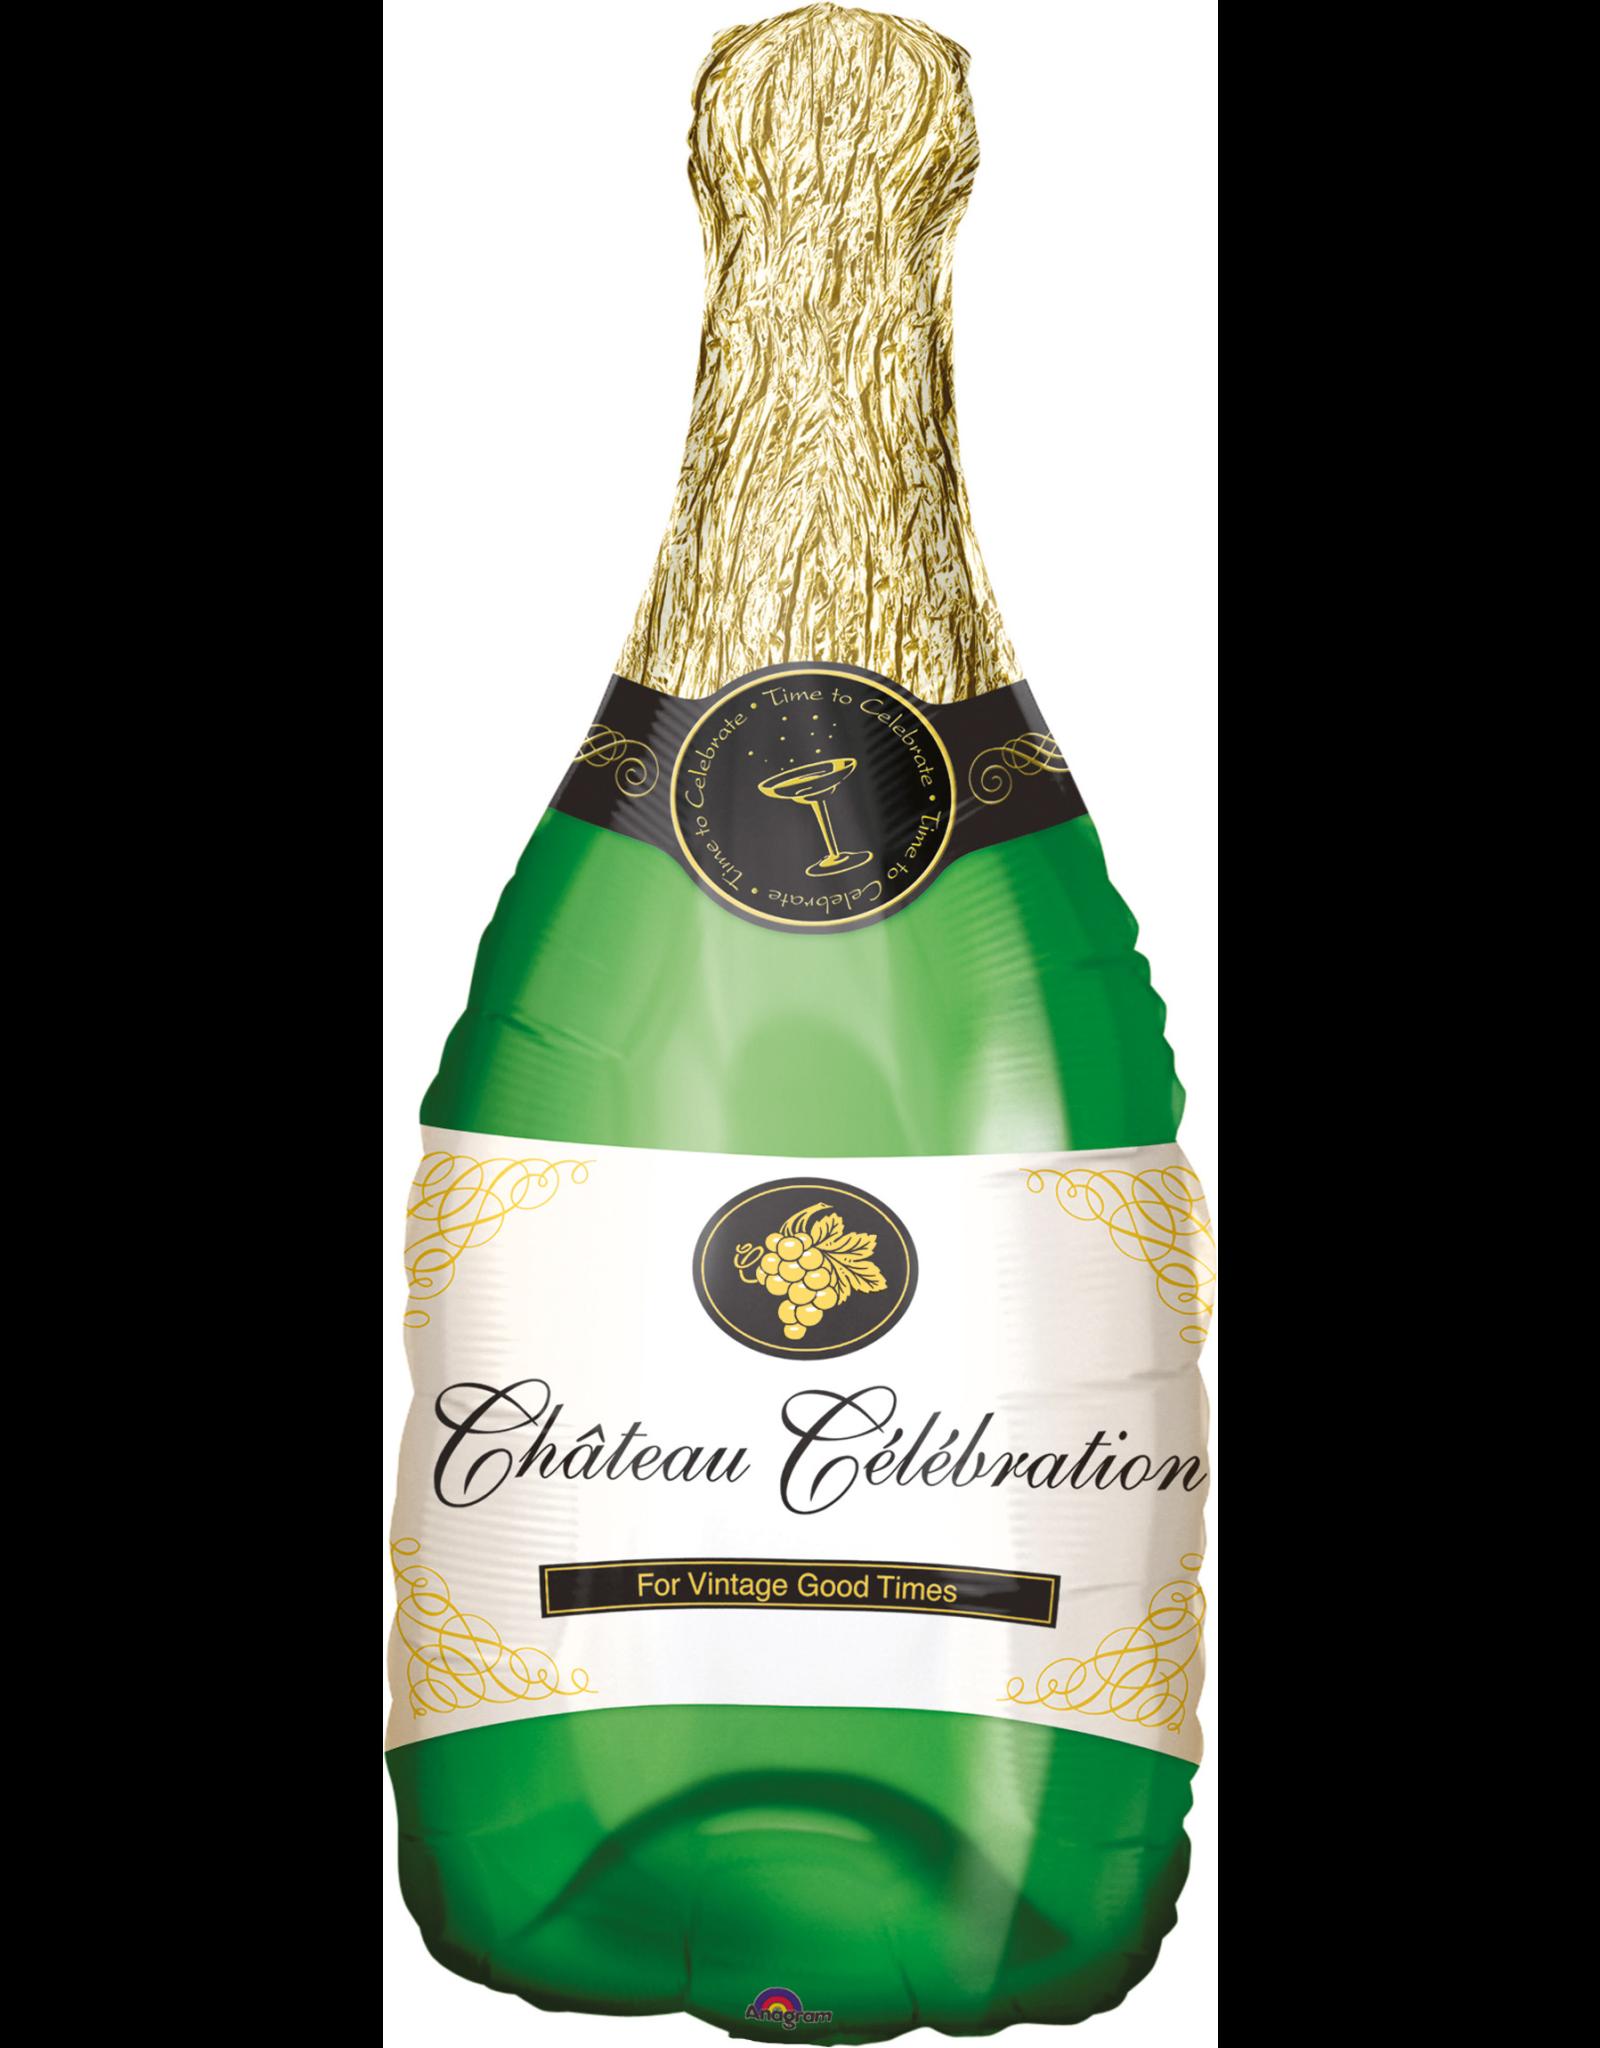 Amscan folieballon champagne bottle 91 x 35 cm